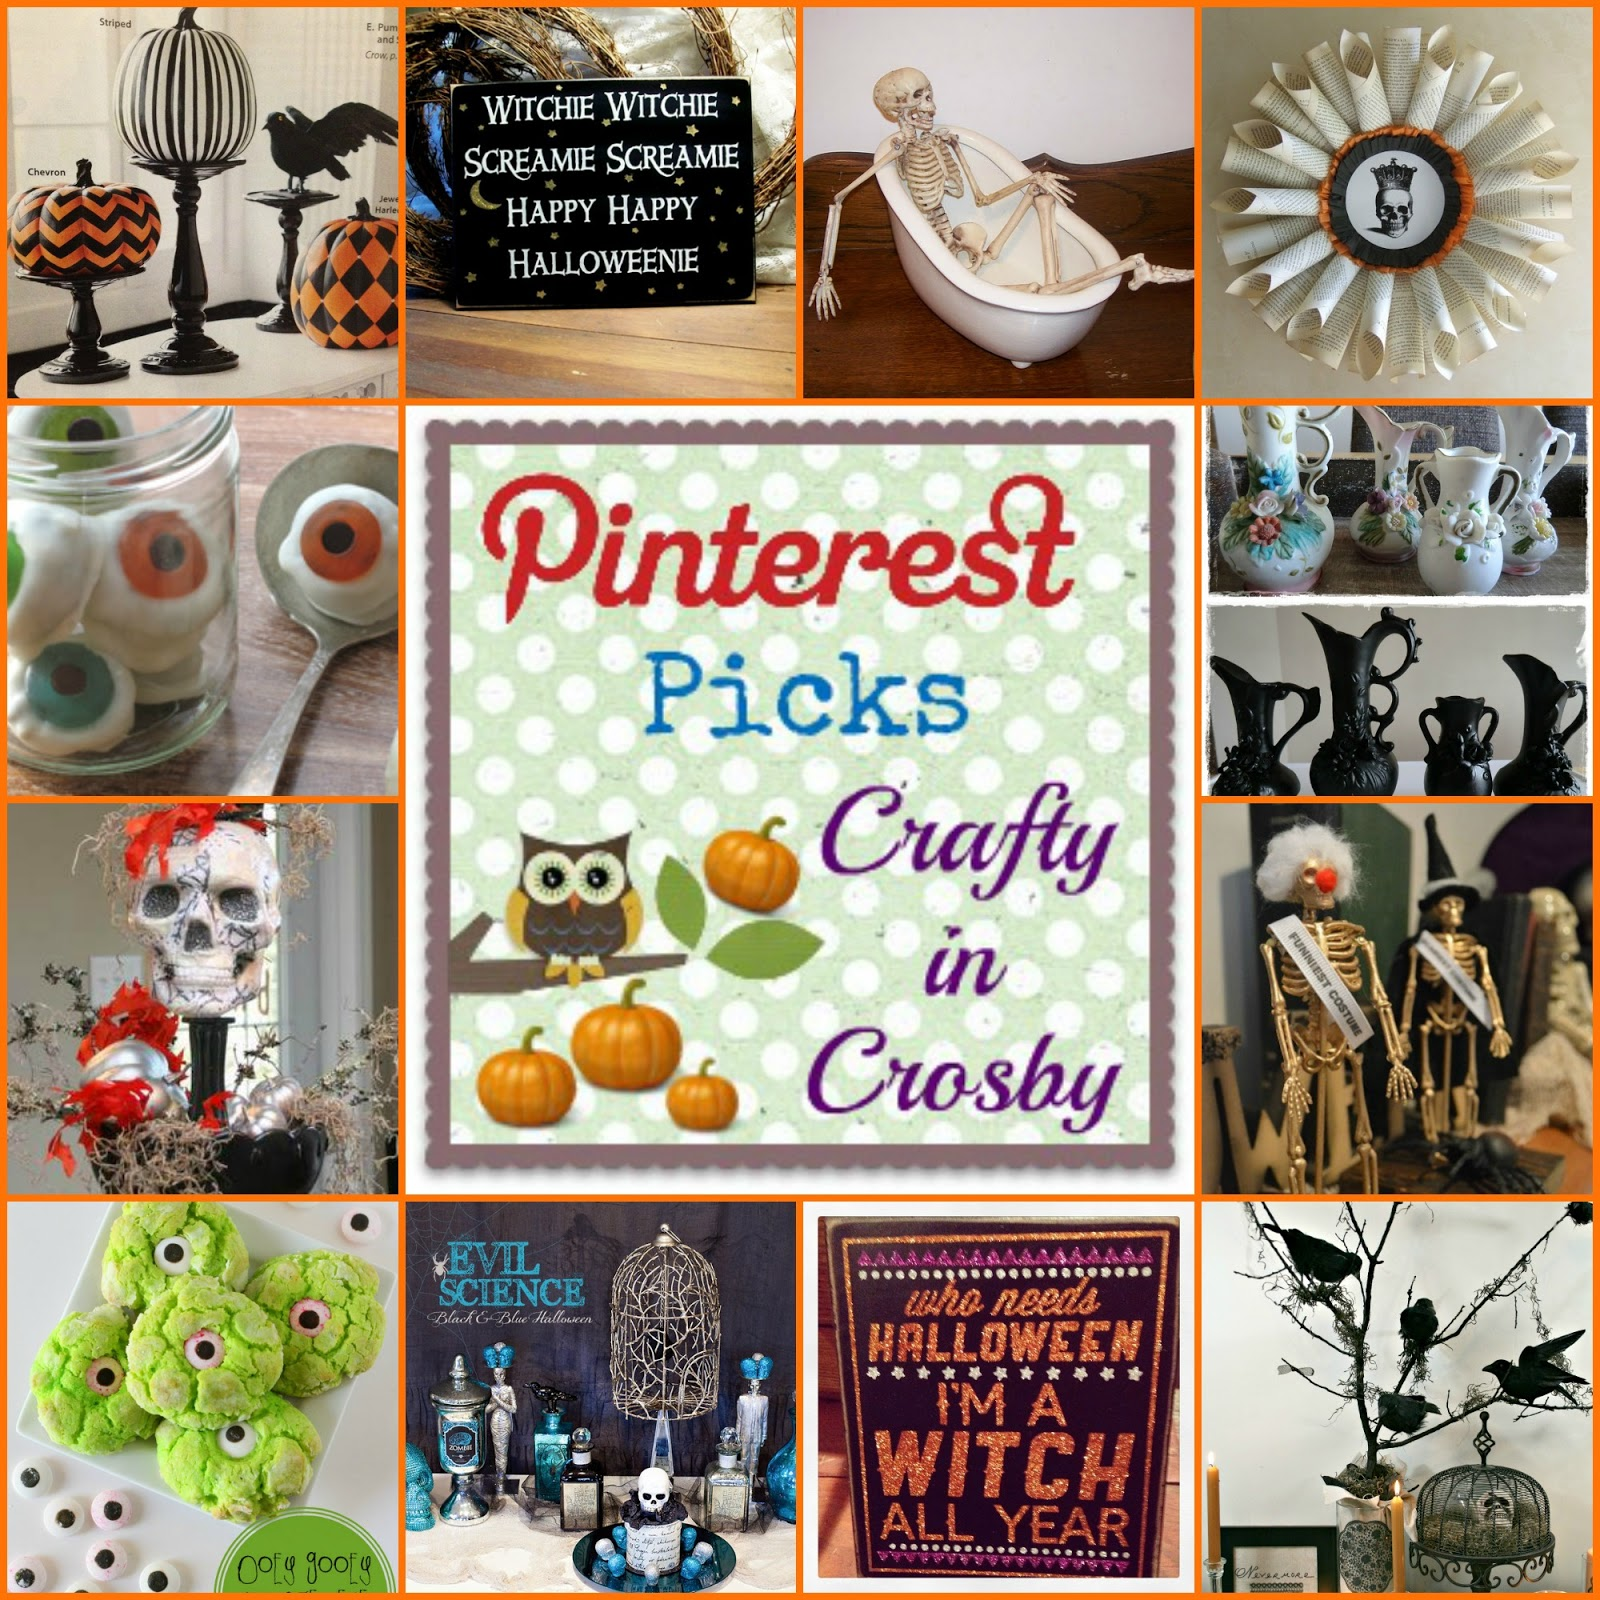 Halloween Home Decor Pinterest: Crafty In Crosby: Halloween Pinterest Picks